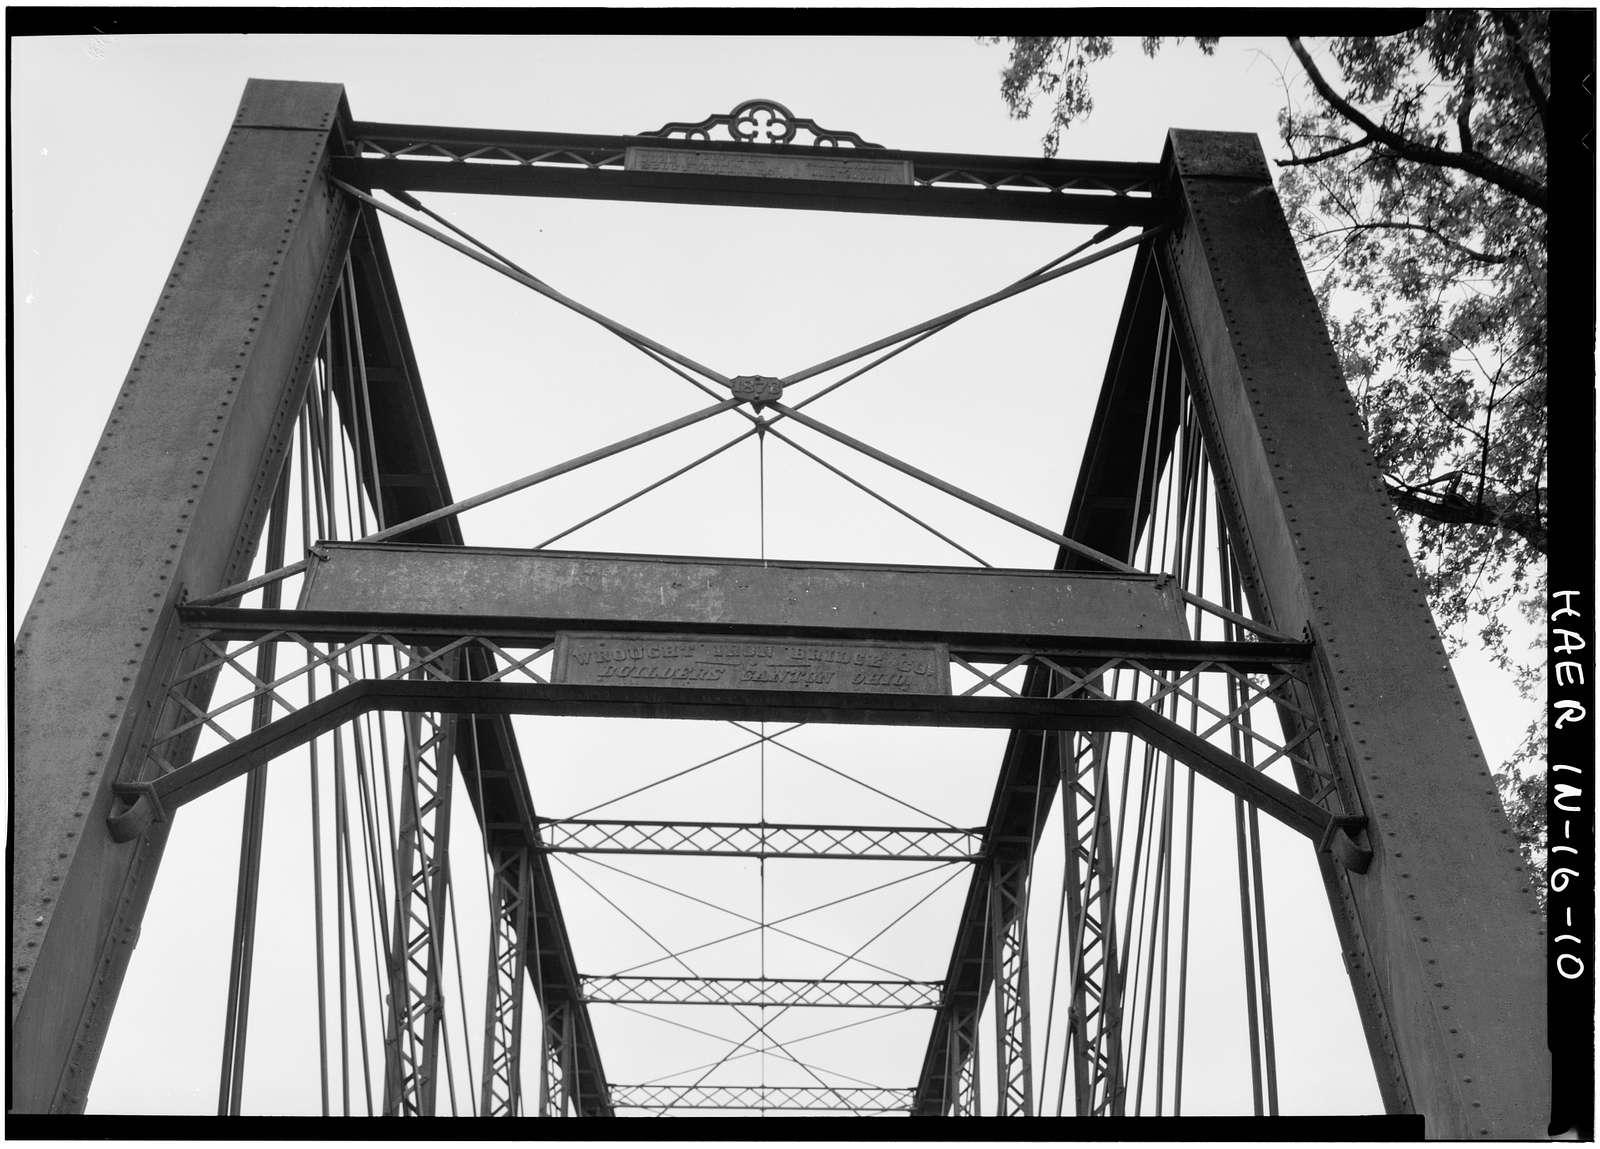 Laughery Creek Bridge, Spanning Laughery Creek, Aurora, Dearborn County, IN